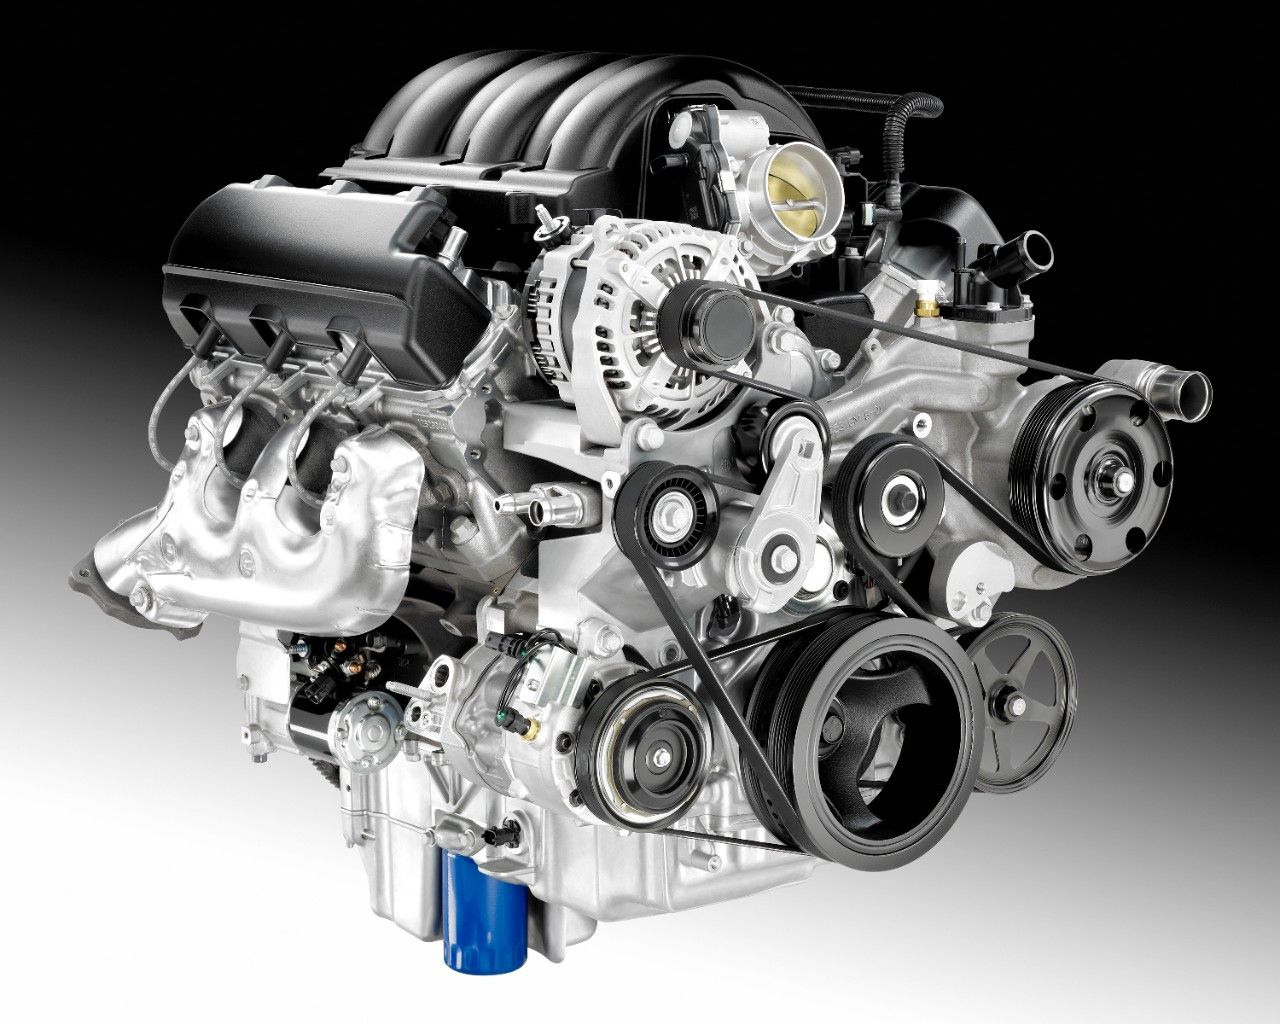 gm shelves vortec engine family name introduces u201cecotec3 u2033 family in rh pinterest com Chevy V6 Engine Diagram Engine Breakdown Diagrams